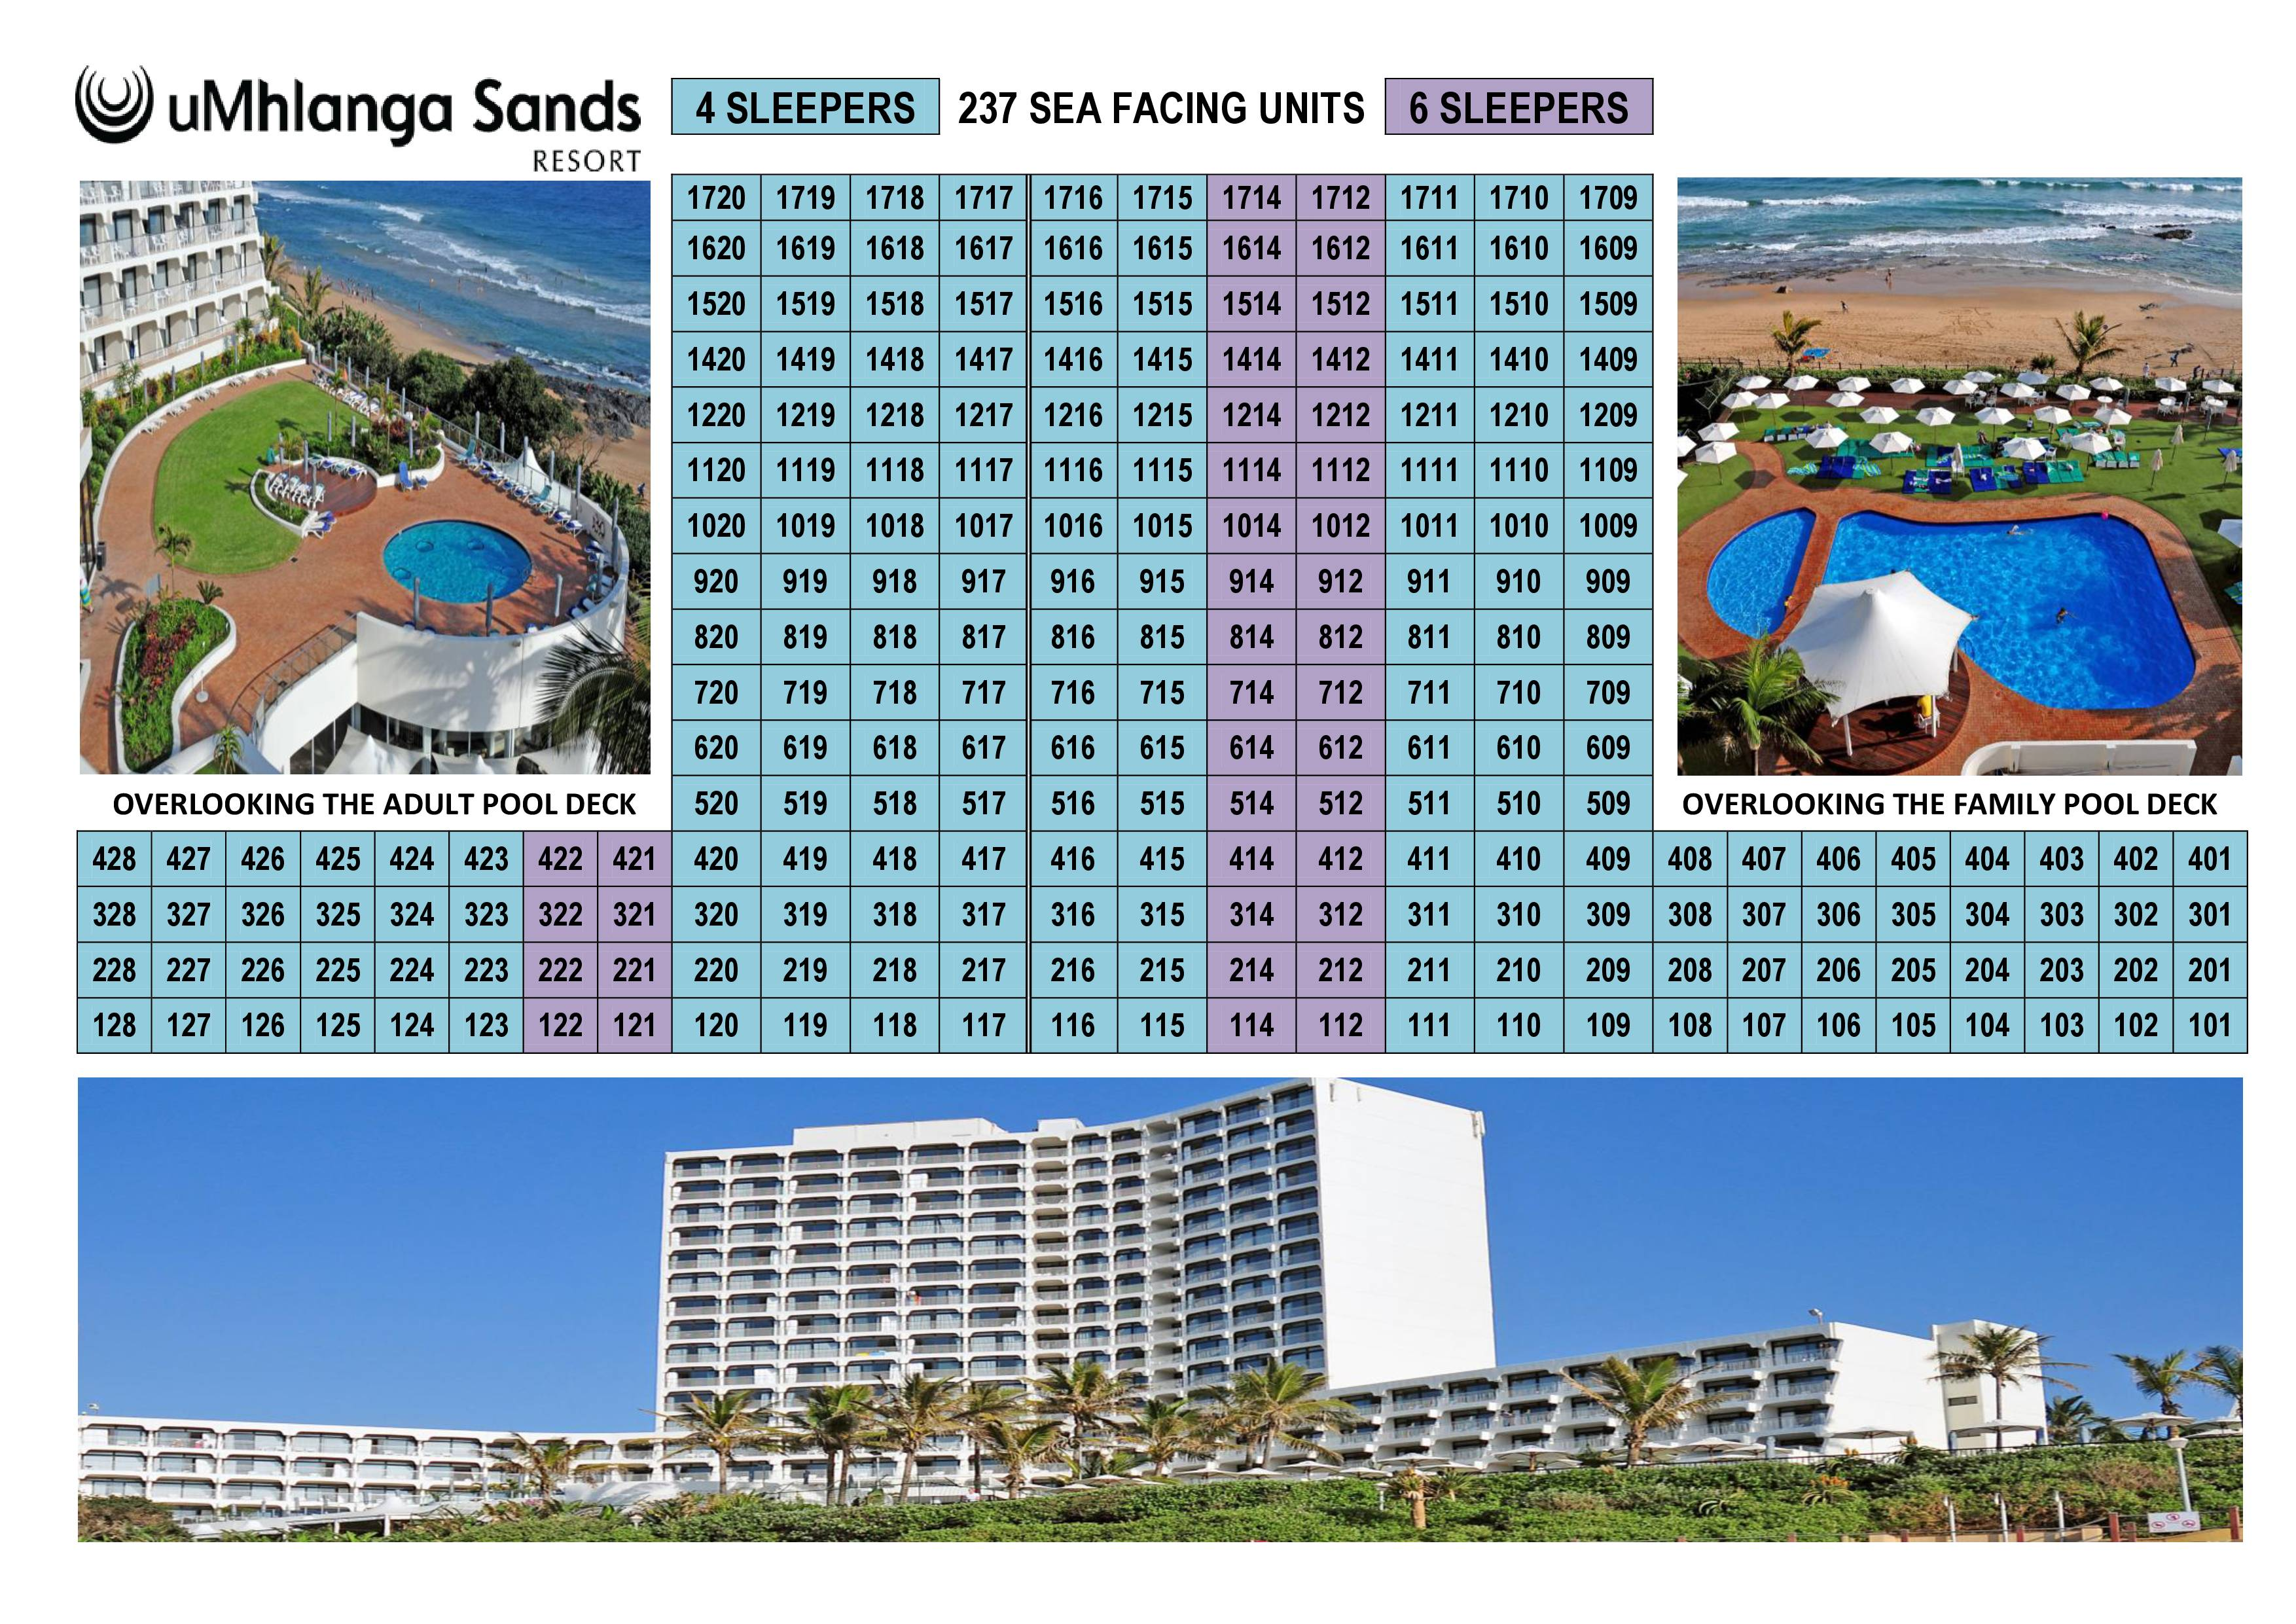 Umhlanga Sands Resort Unit Layout of Building